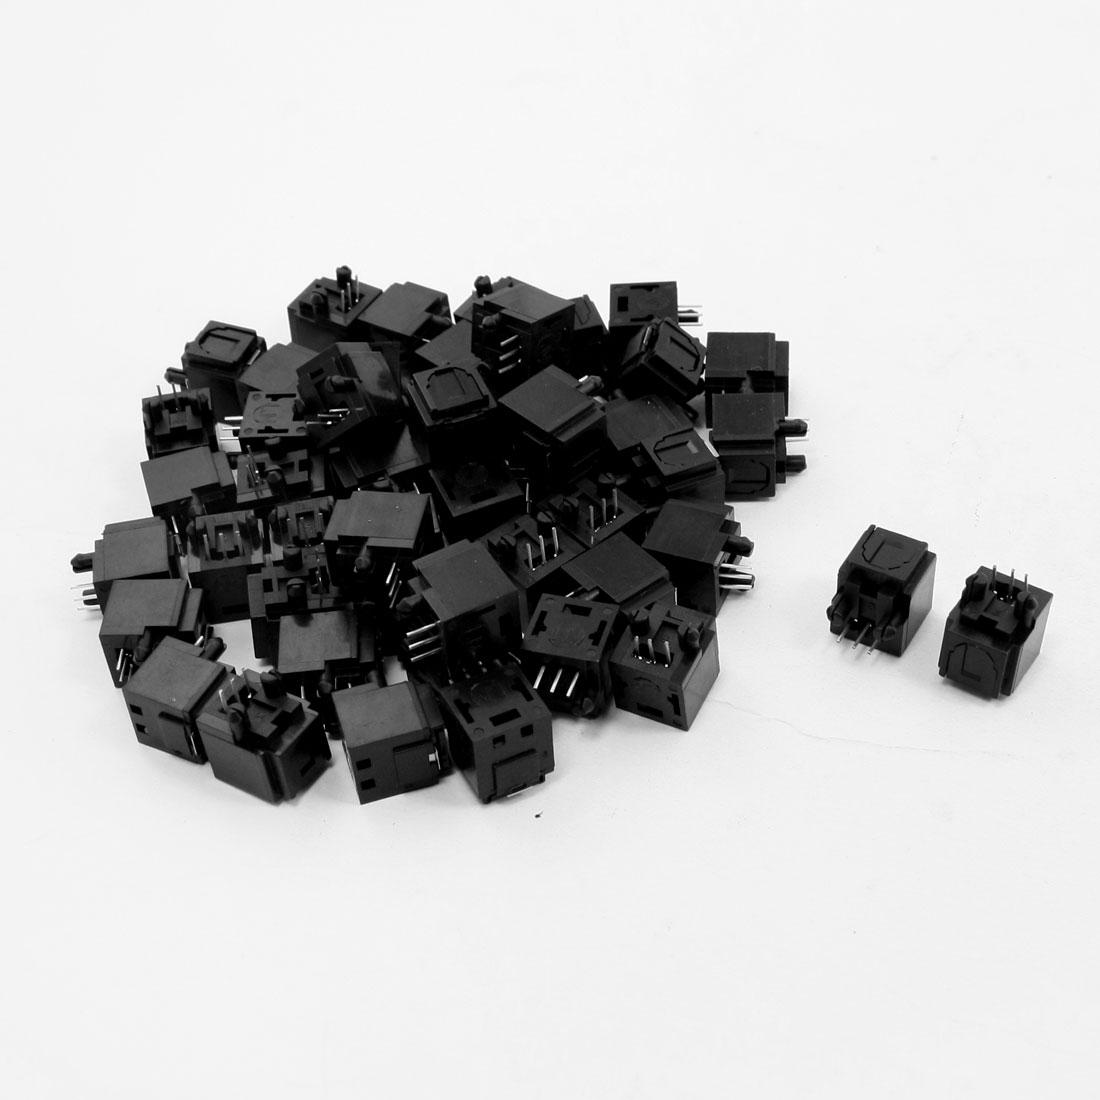 50 Pcs Optical Fibers Jack Sockets 16mmx14mmx12mm for A/V Audio Video